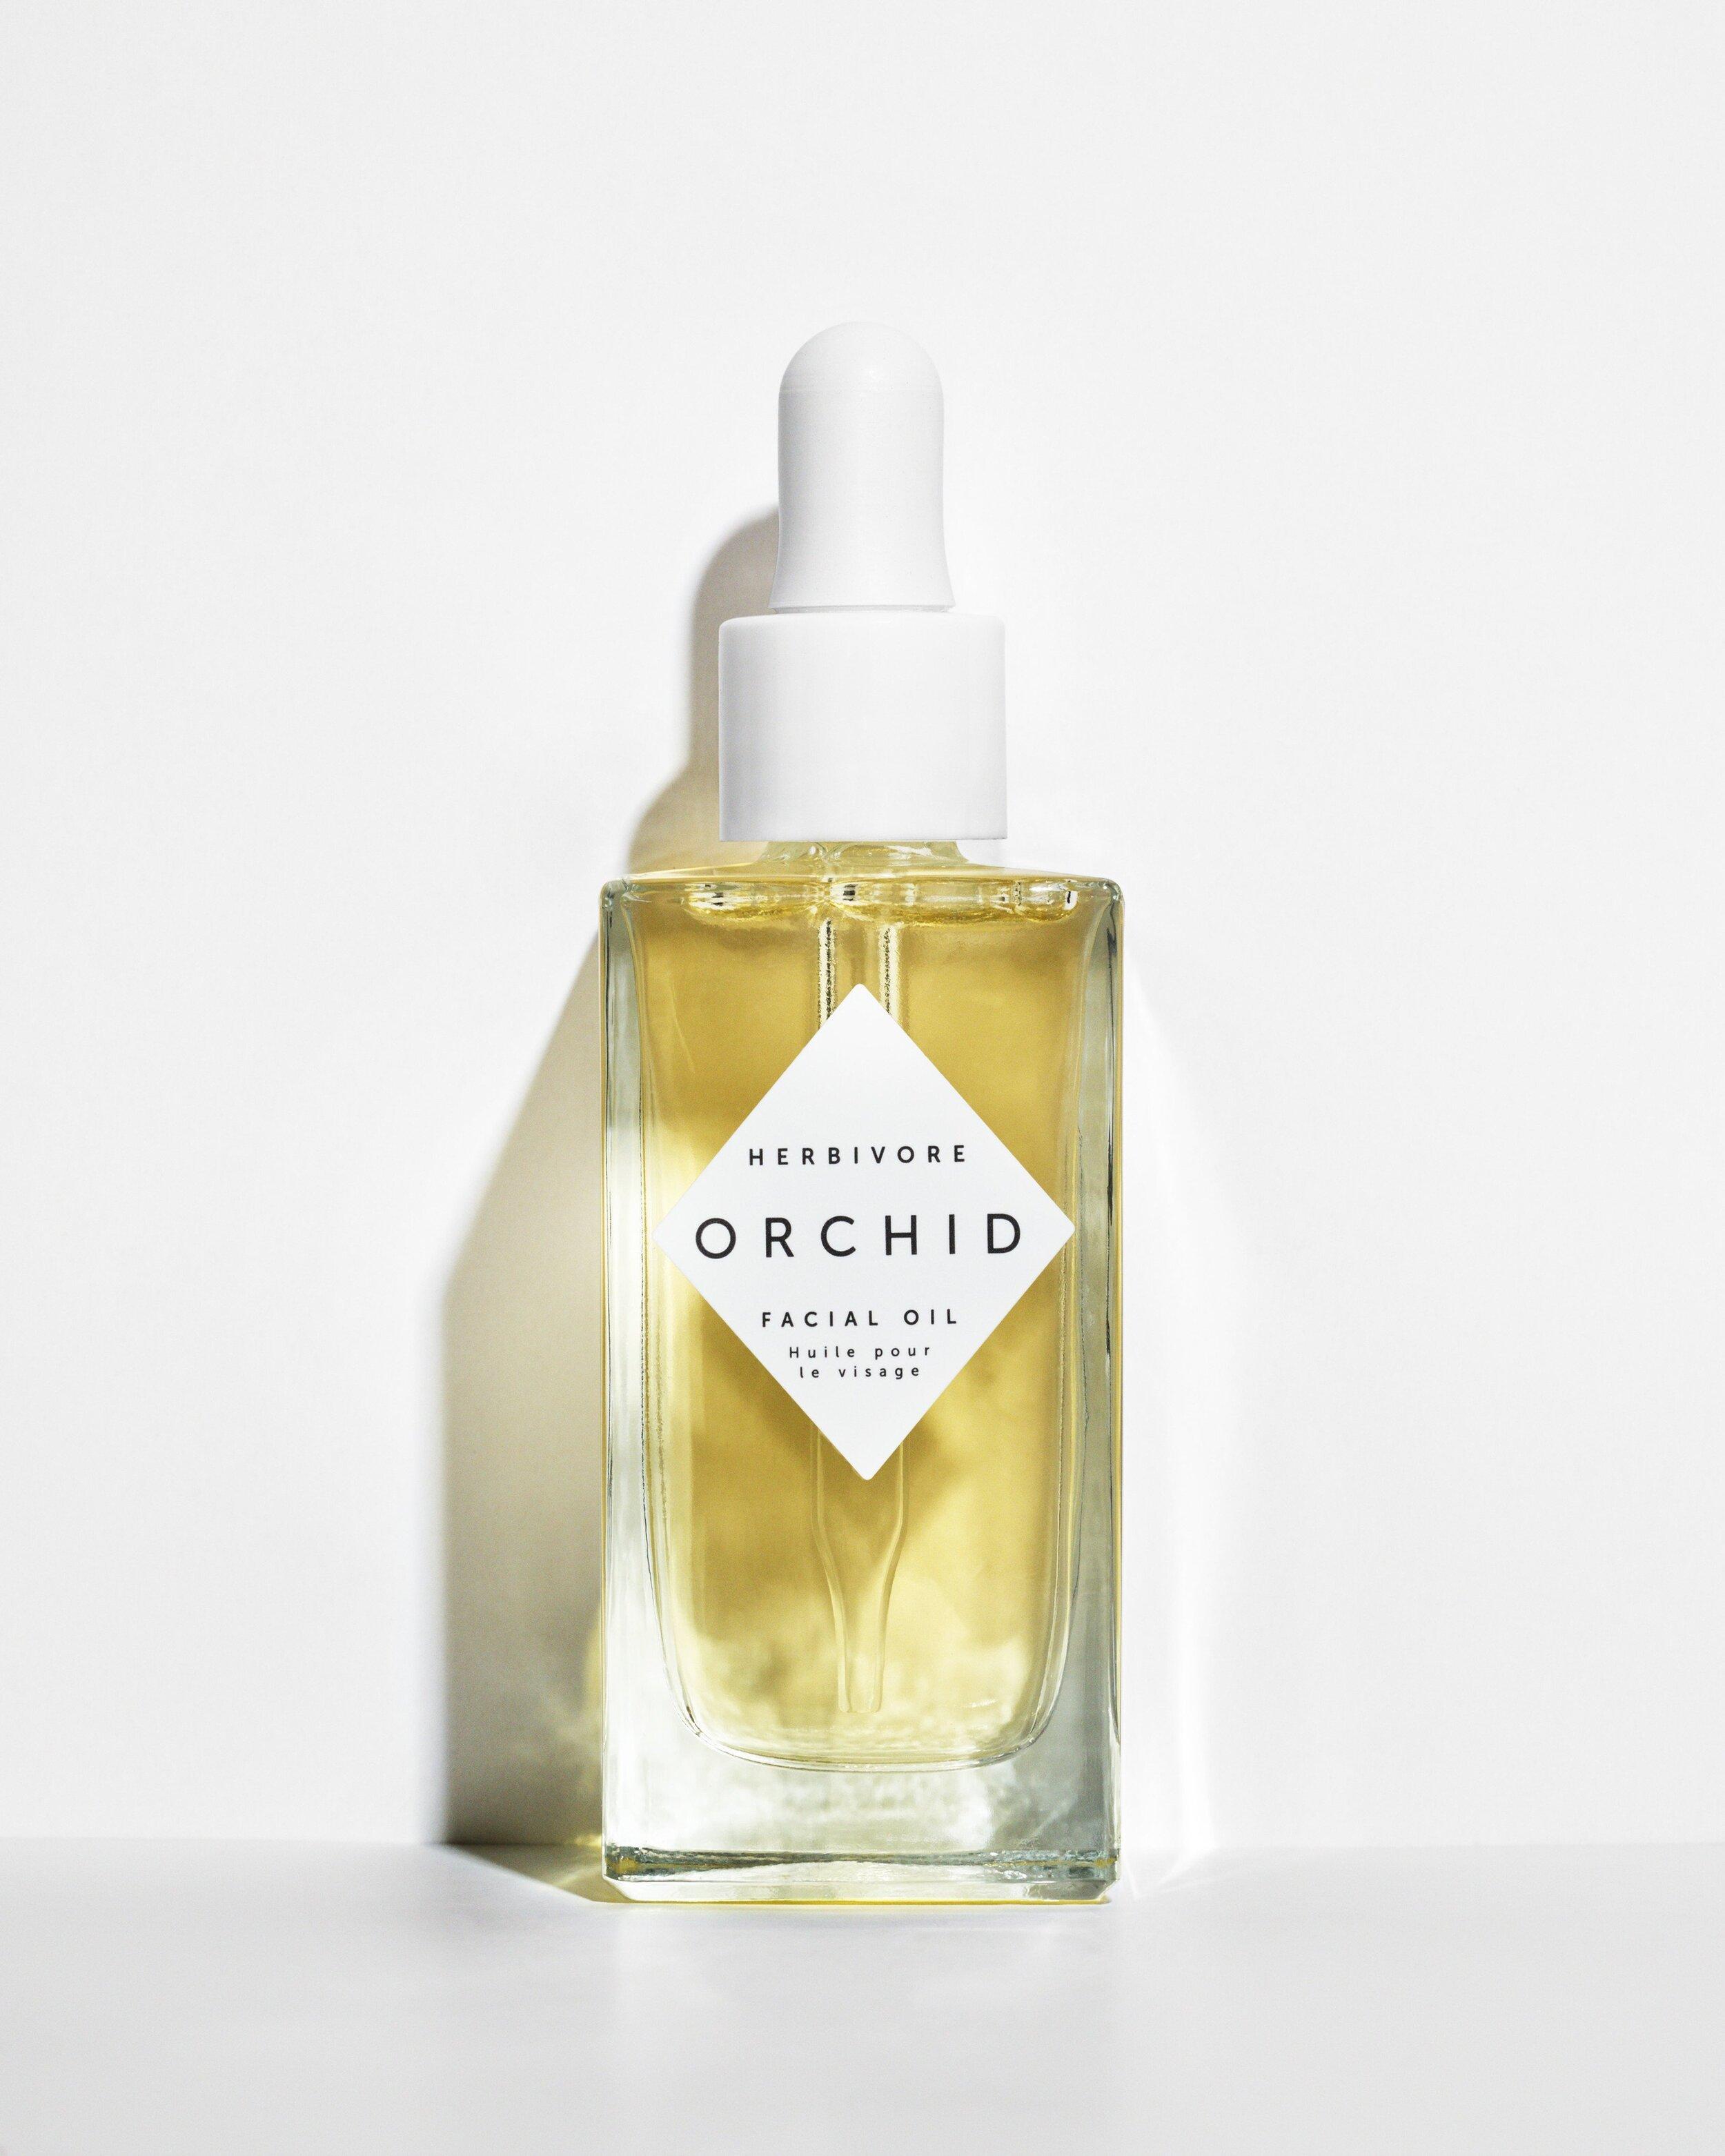 Herbivore Orchid Facial Oil - $64